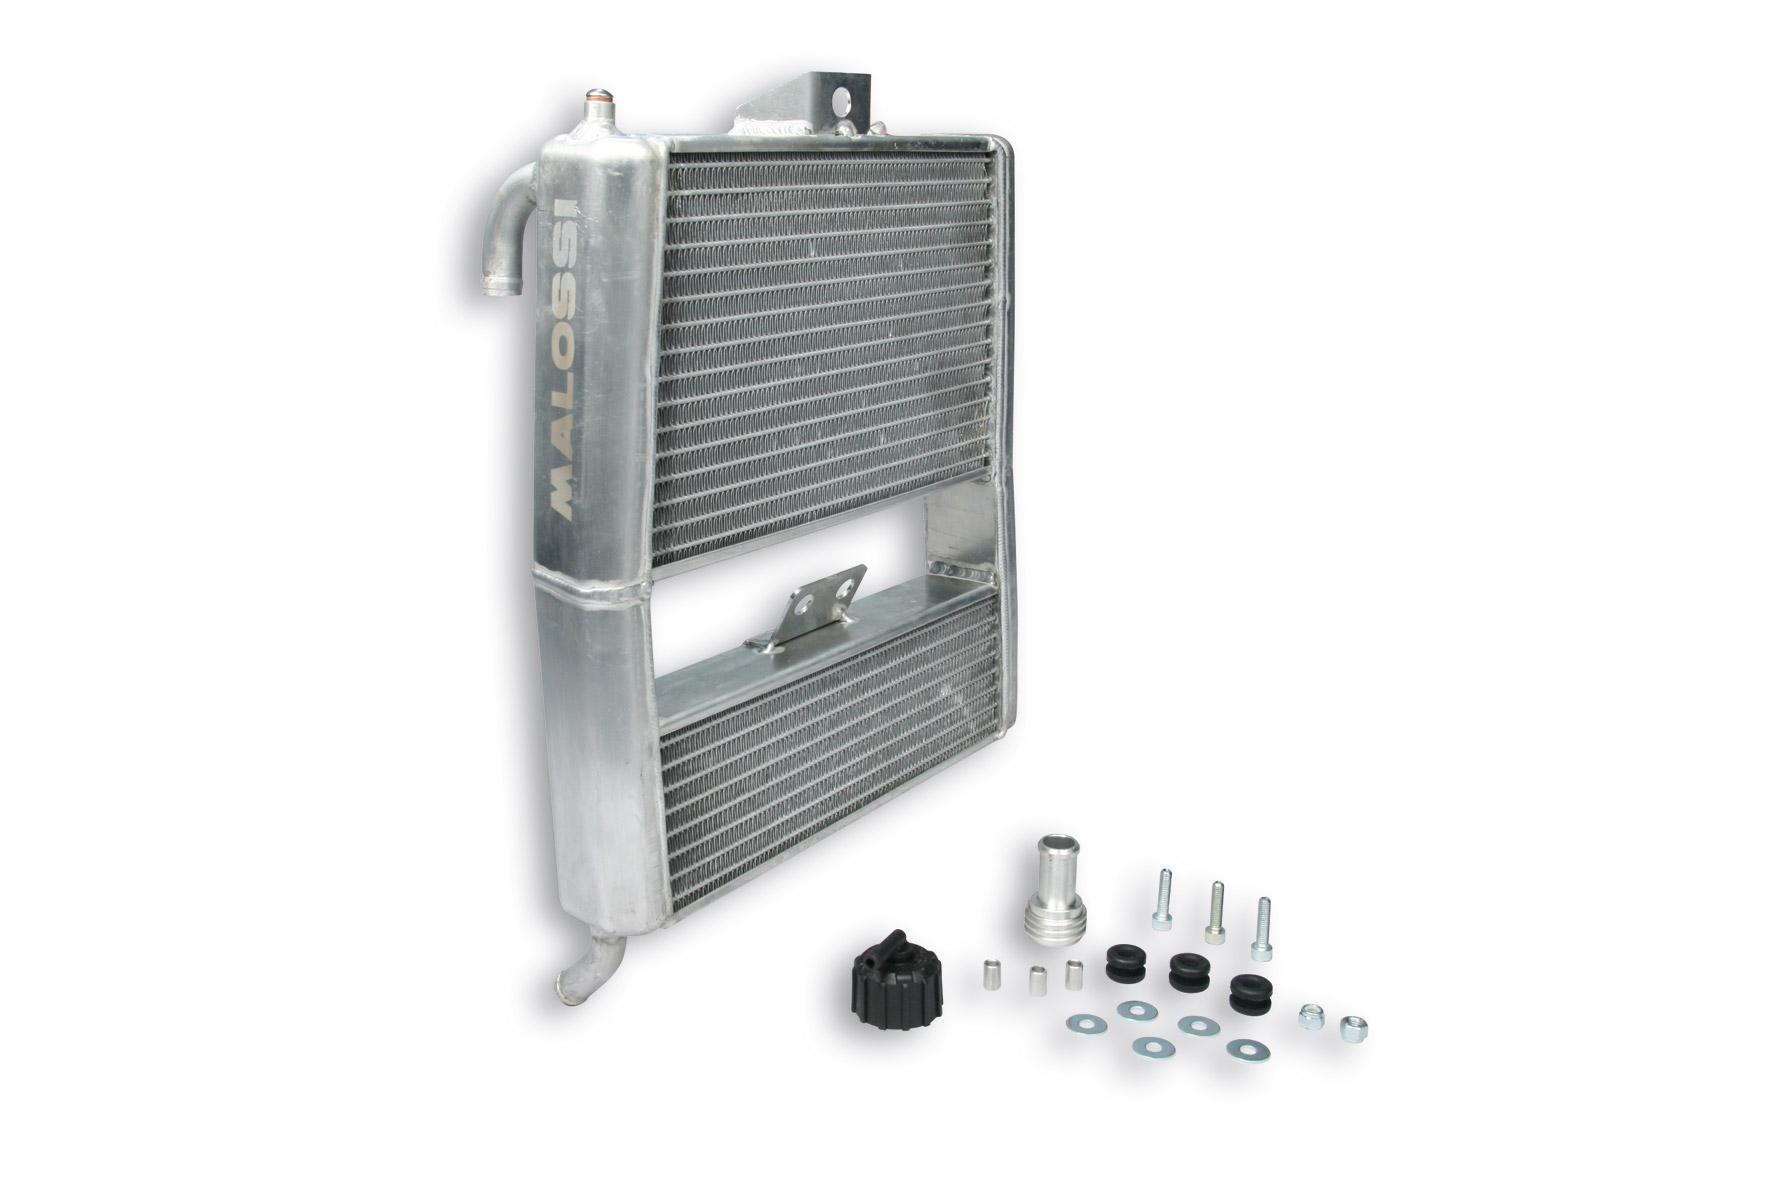 vendita online radiatori - dissipatori - tubi